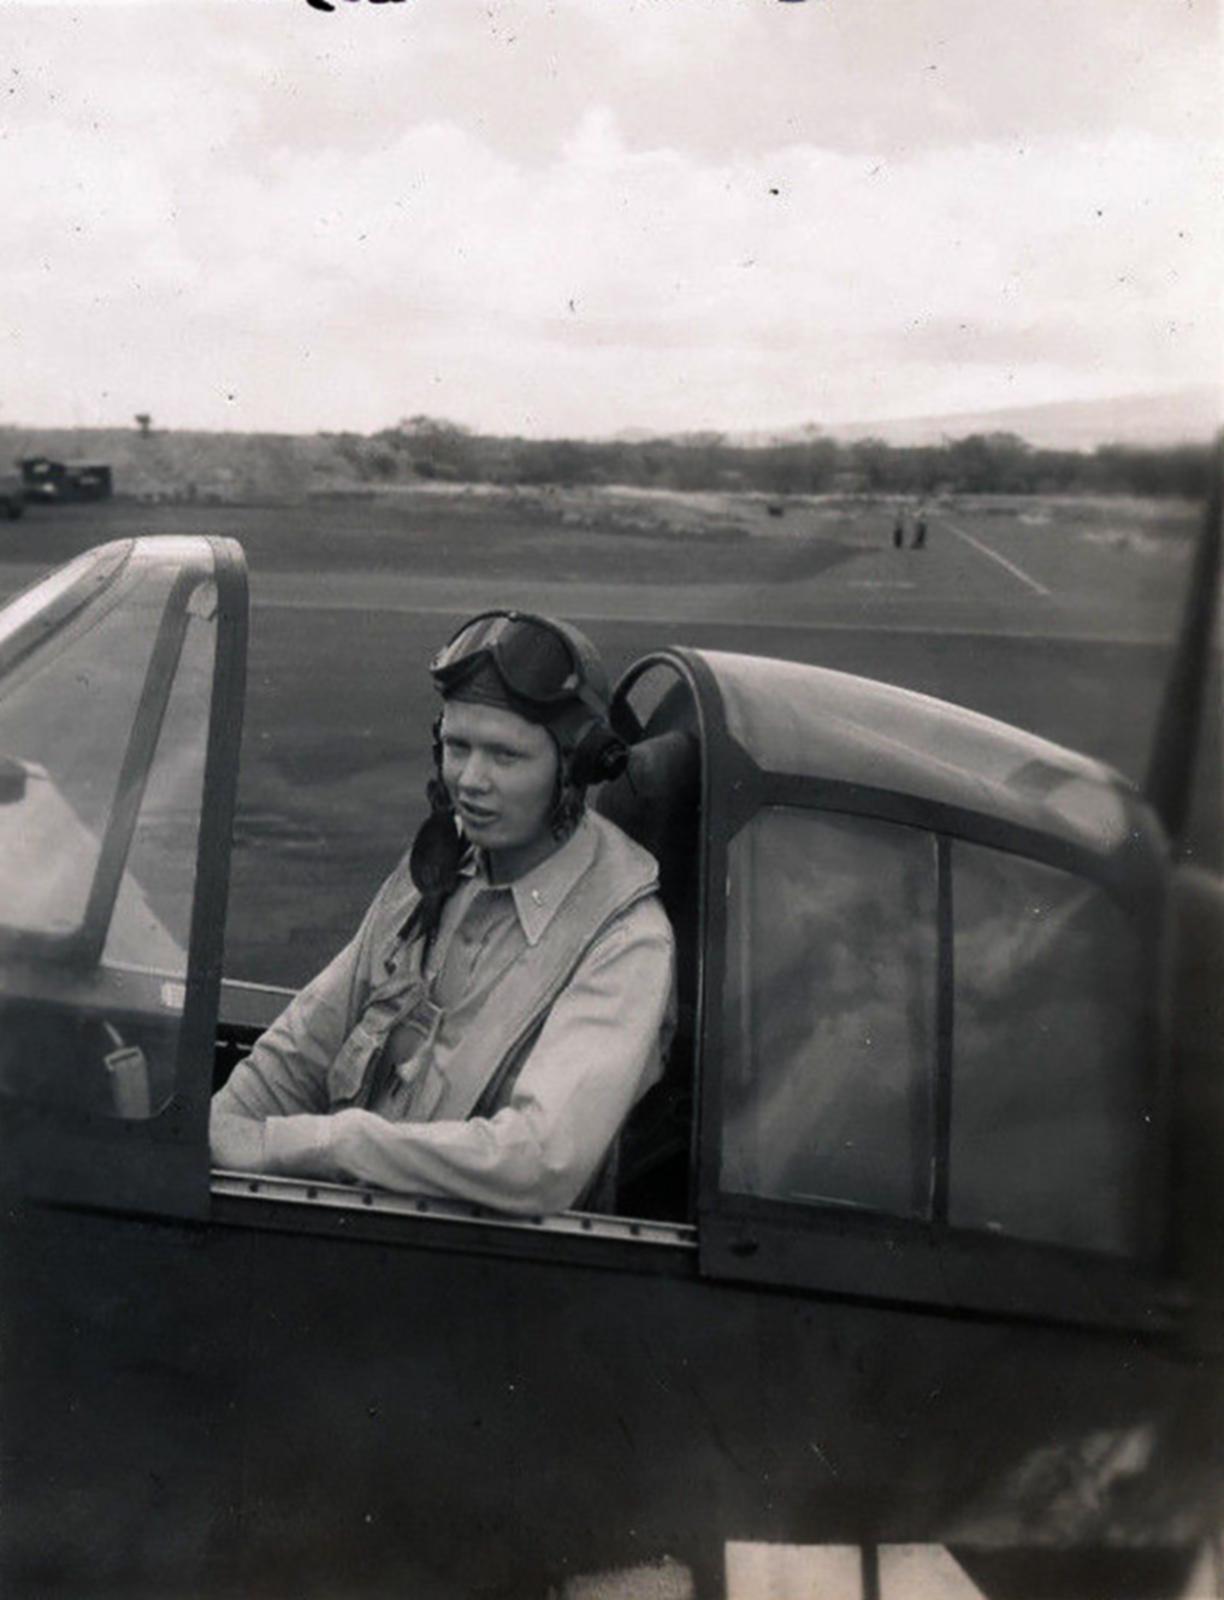 Aircrew USN VBF 8 LtJG Hubbard NAS Puunene 1945 01